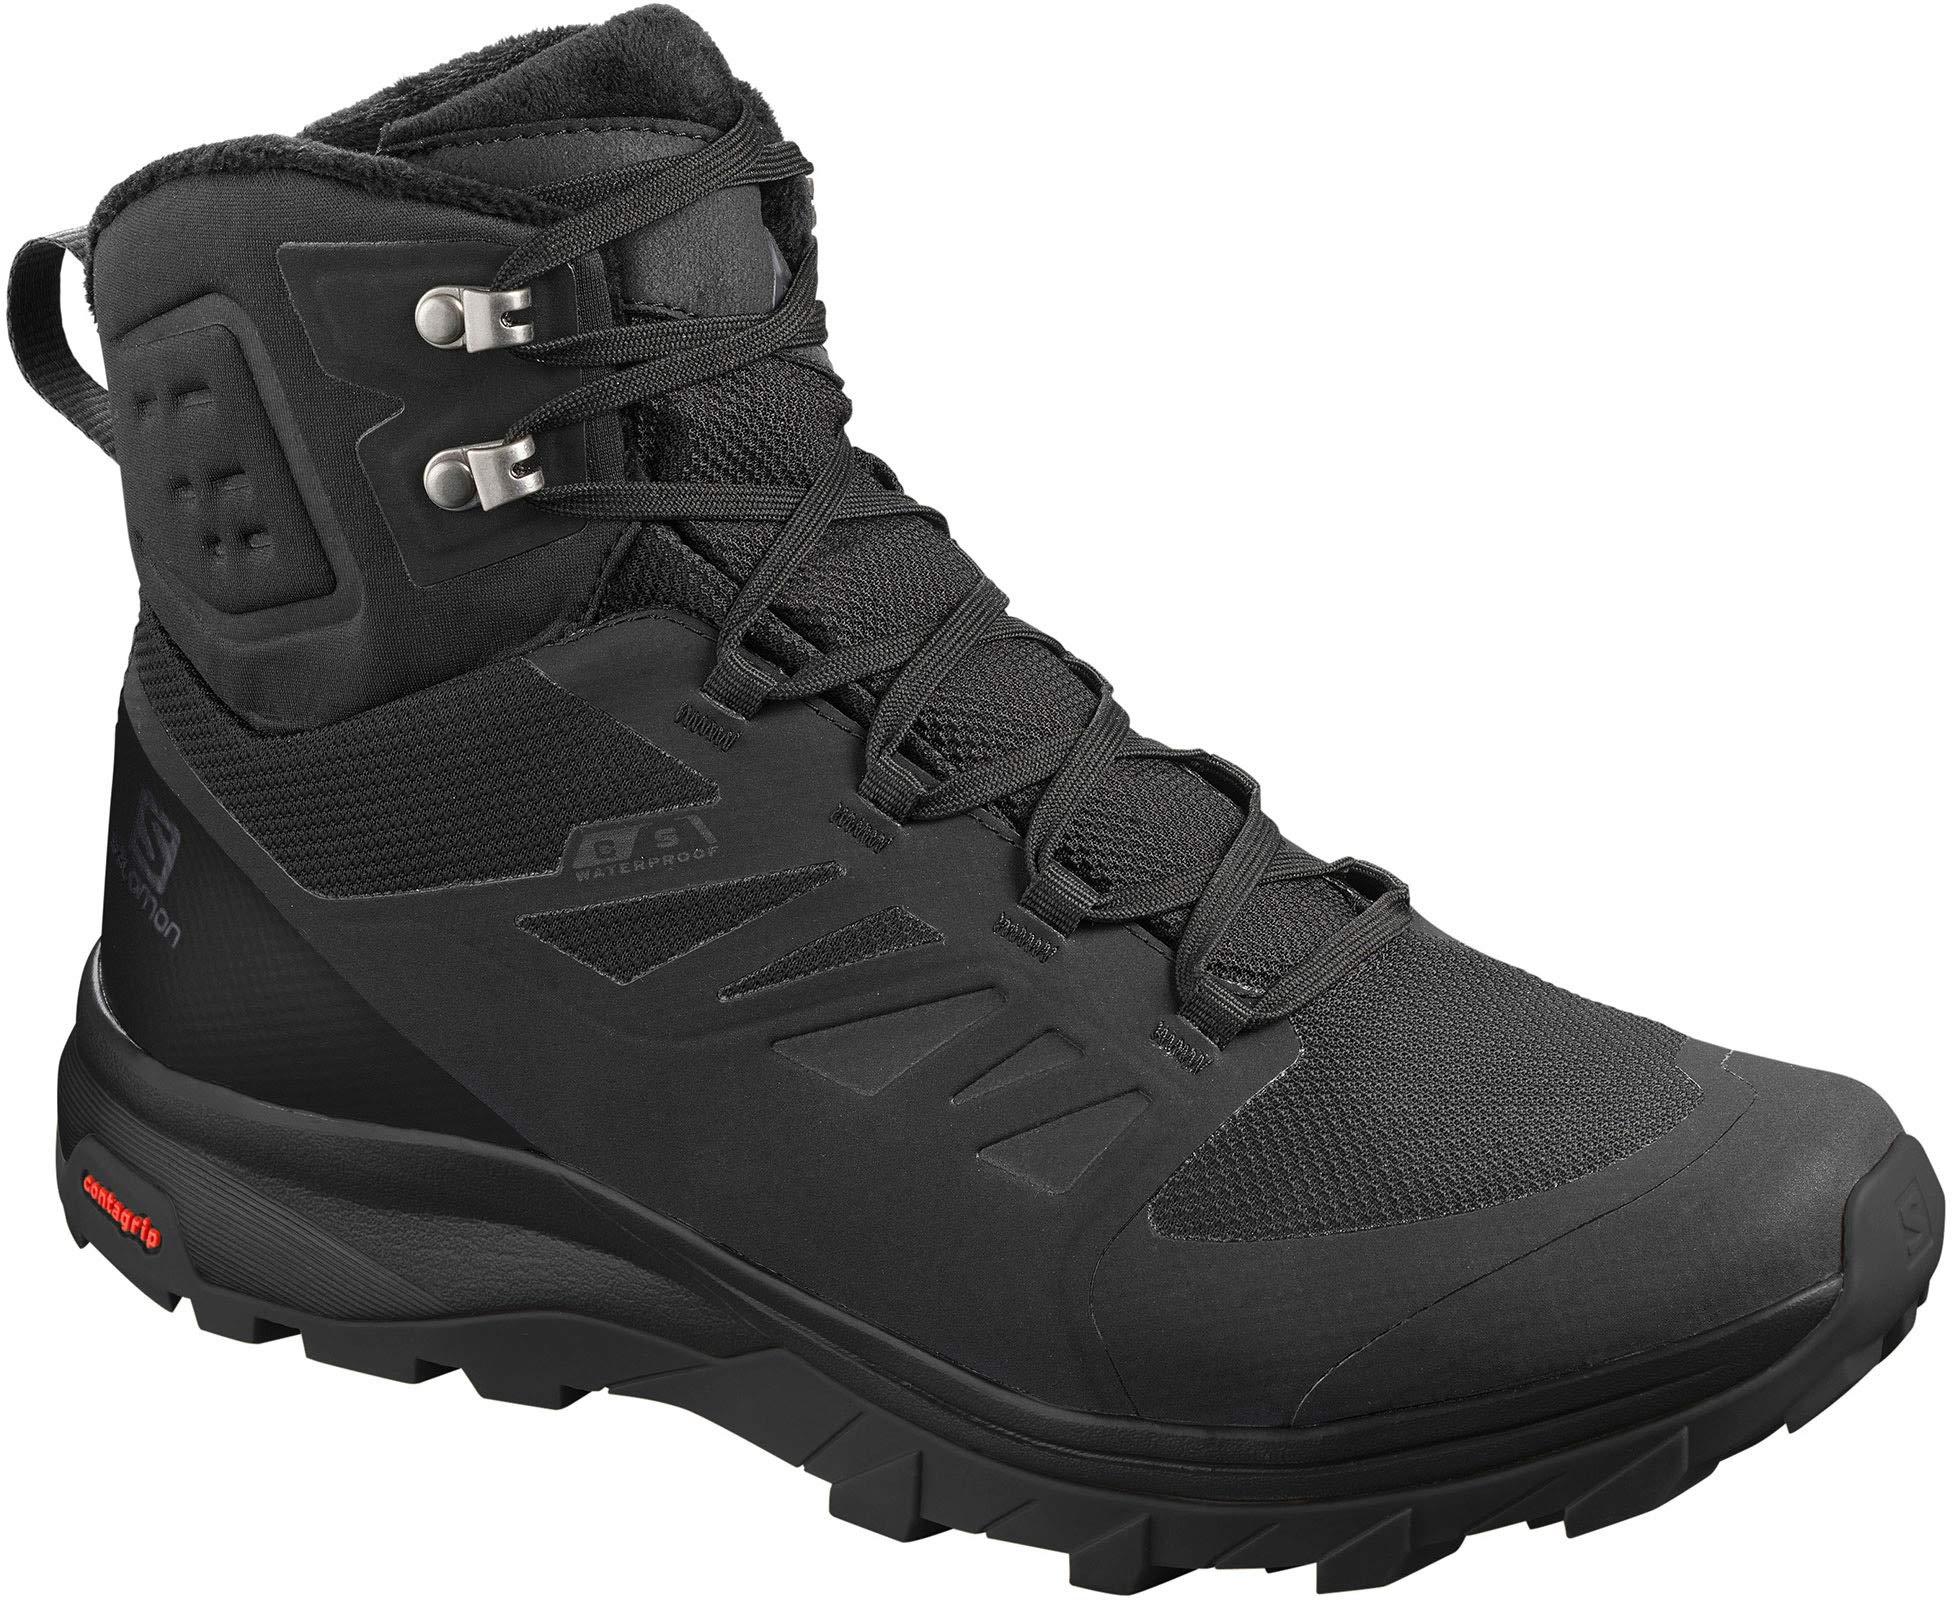 Salomon Mens Outblast Boots Black